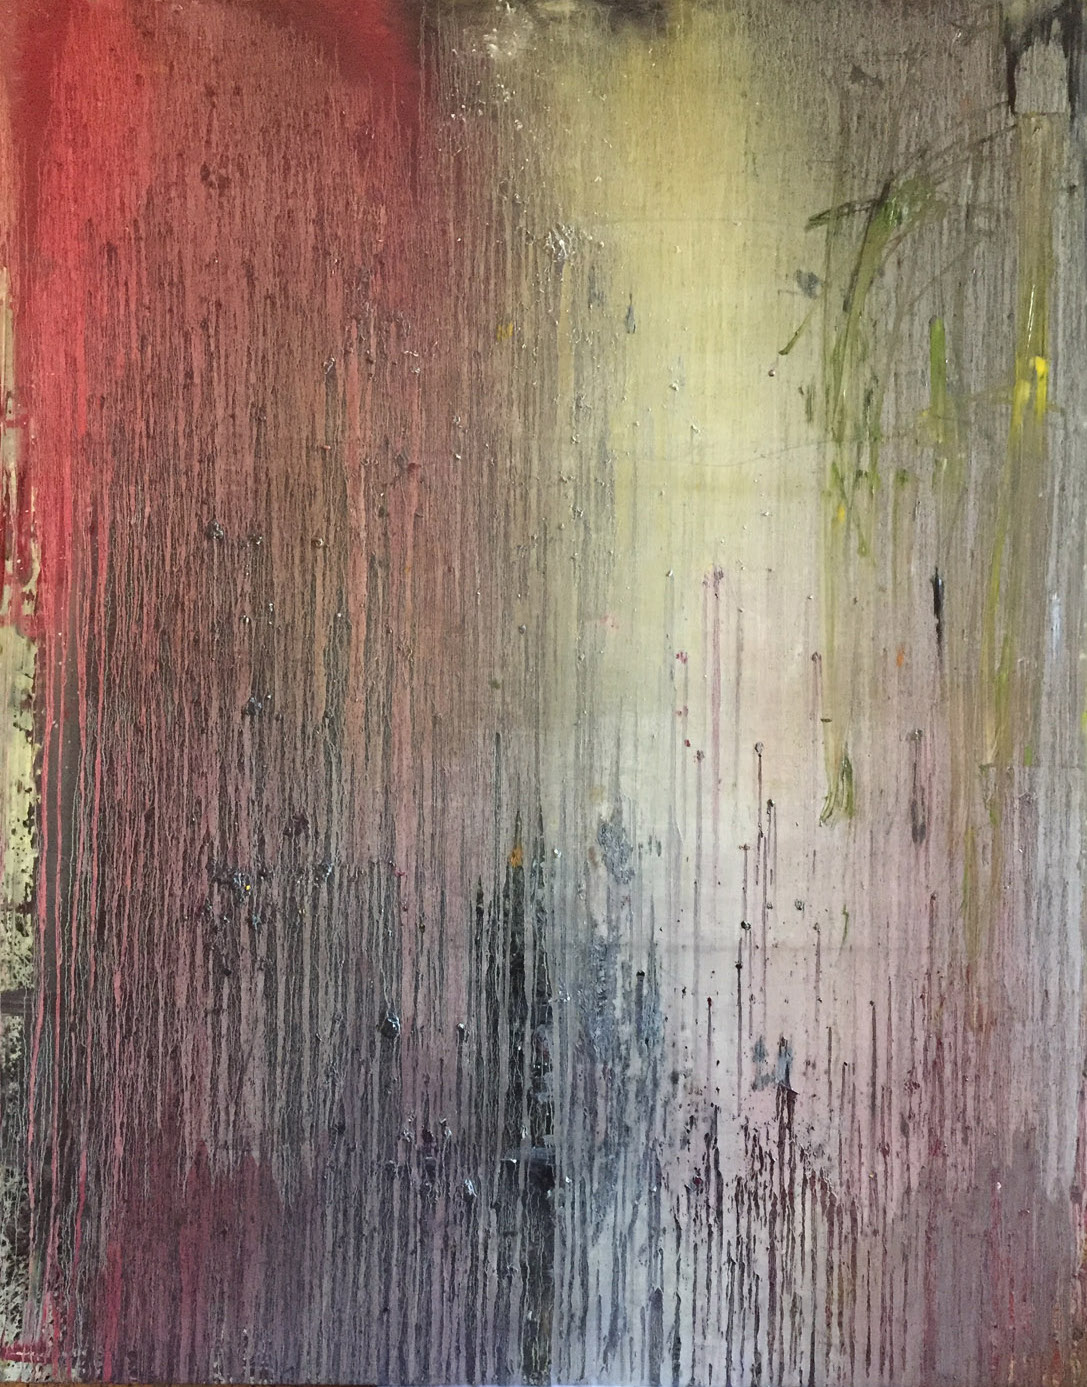 MARC FELD 2020 DICKINSON Huile sur toile 160 x 200 cm